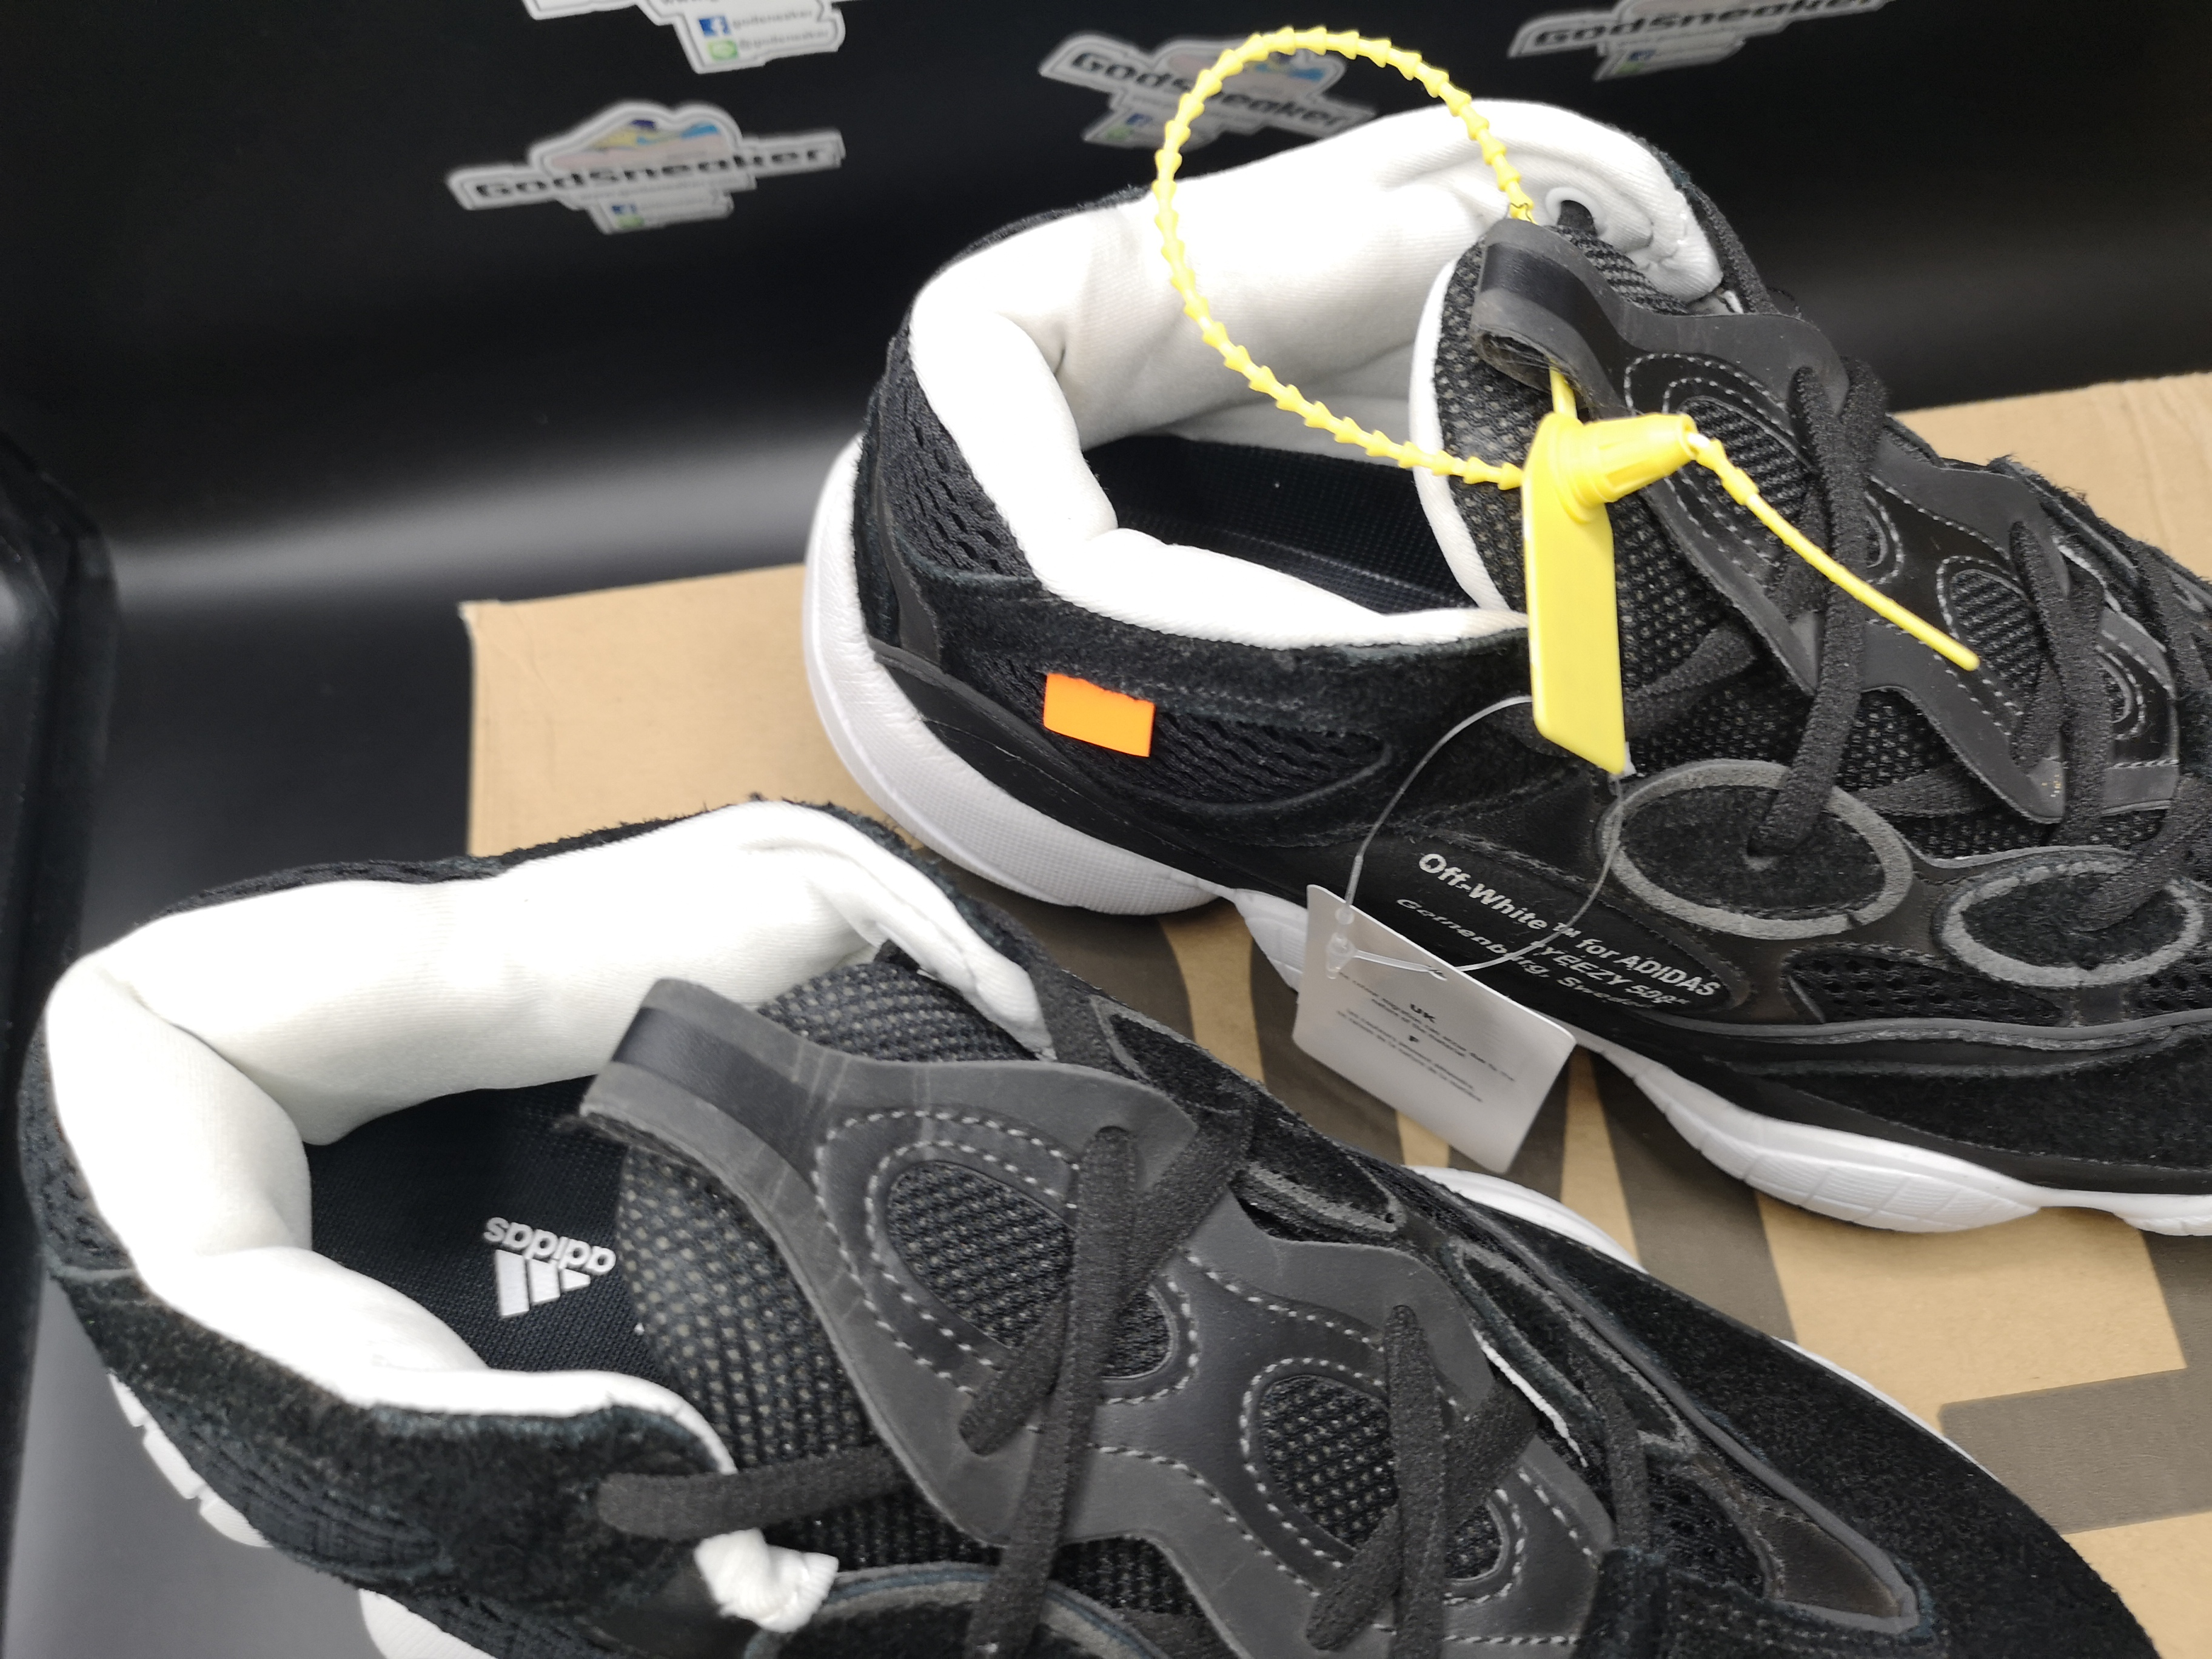 197e82dc26a Virgil Abloh Off-White x Kanye West x adidas Yeezy 500 Black Size 36 ...